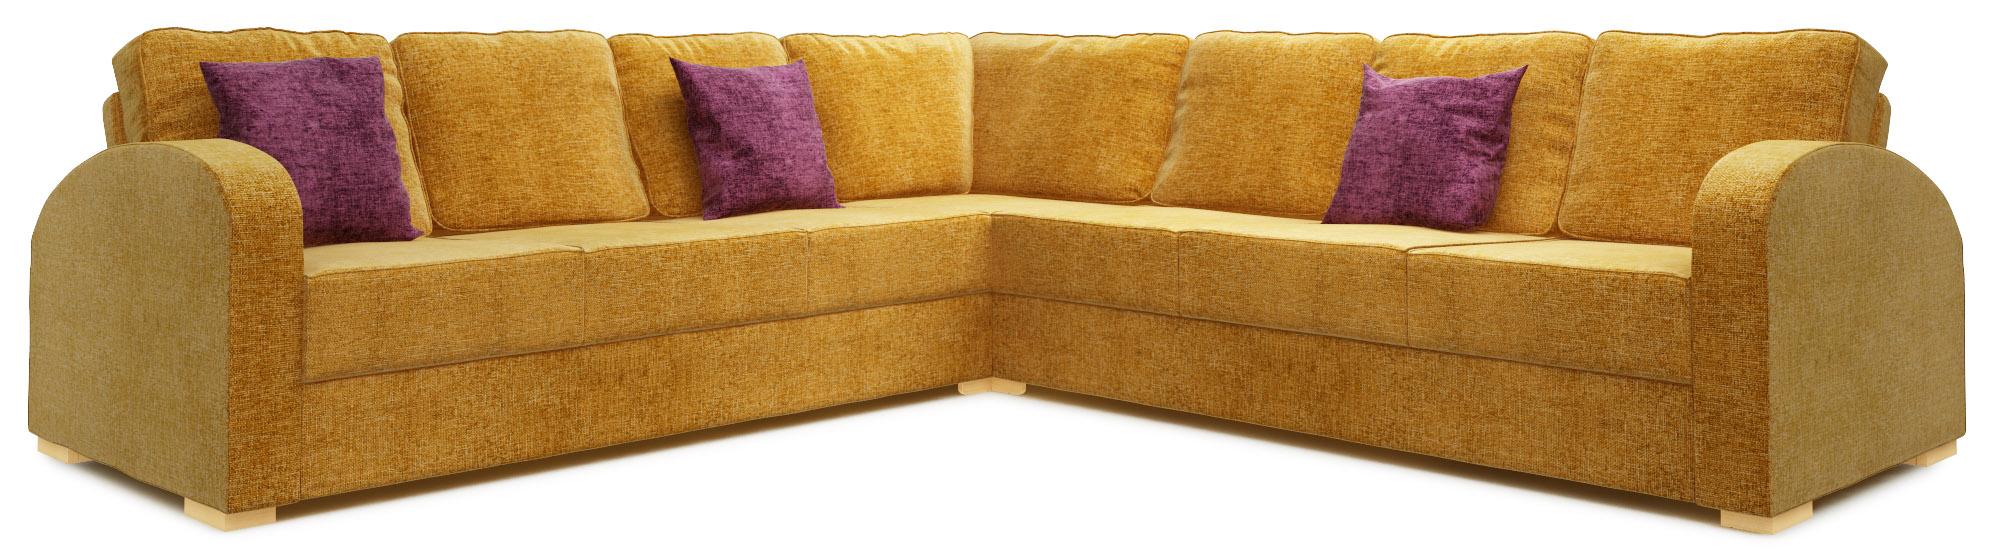 Orb 4x4 Corner Sofa